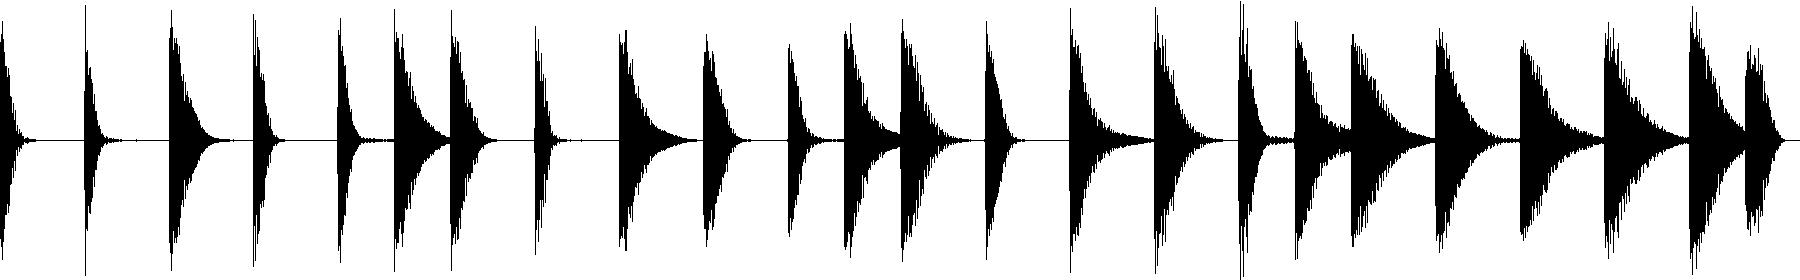 dts chordlp 12 cm dry